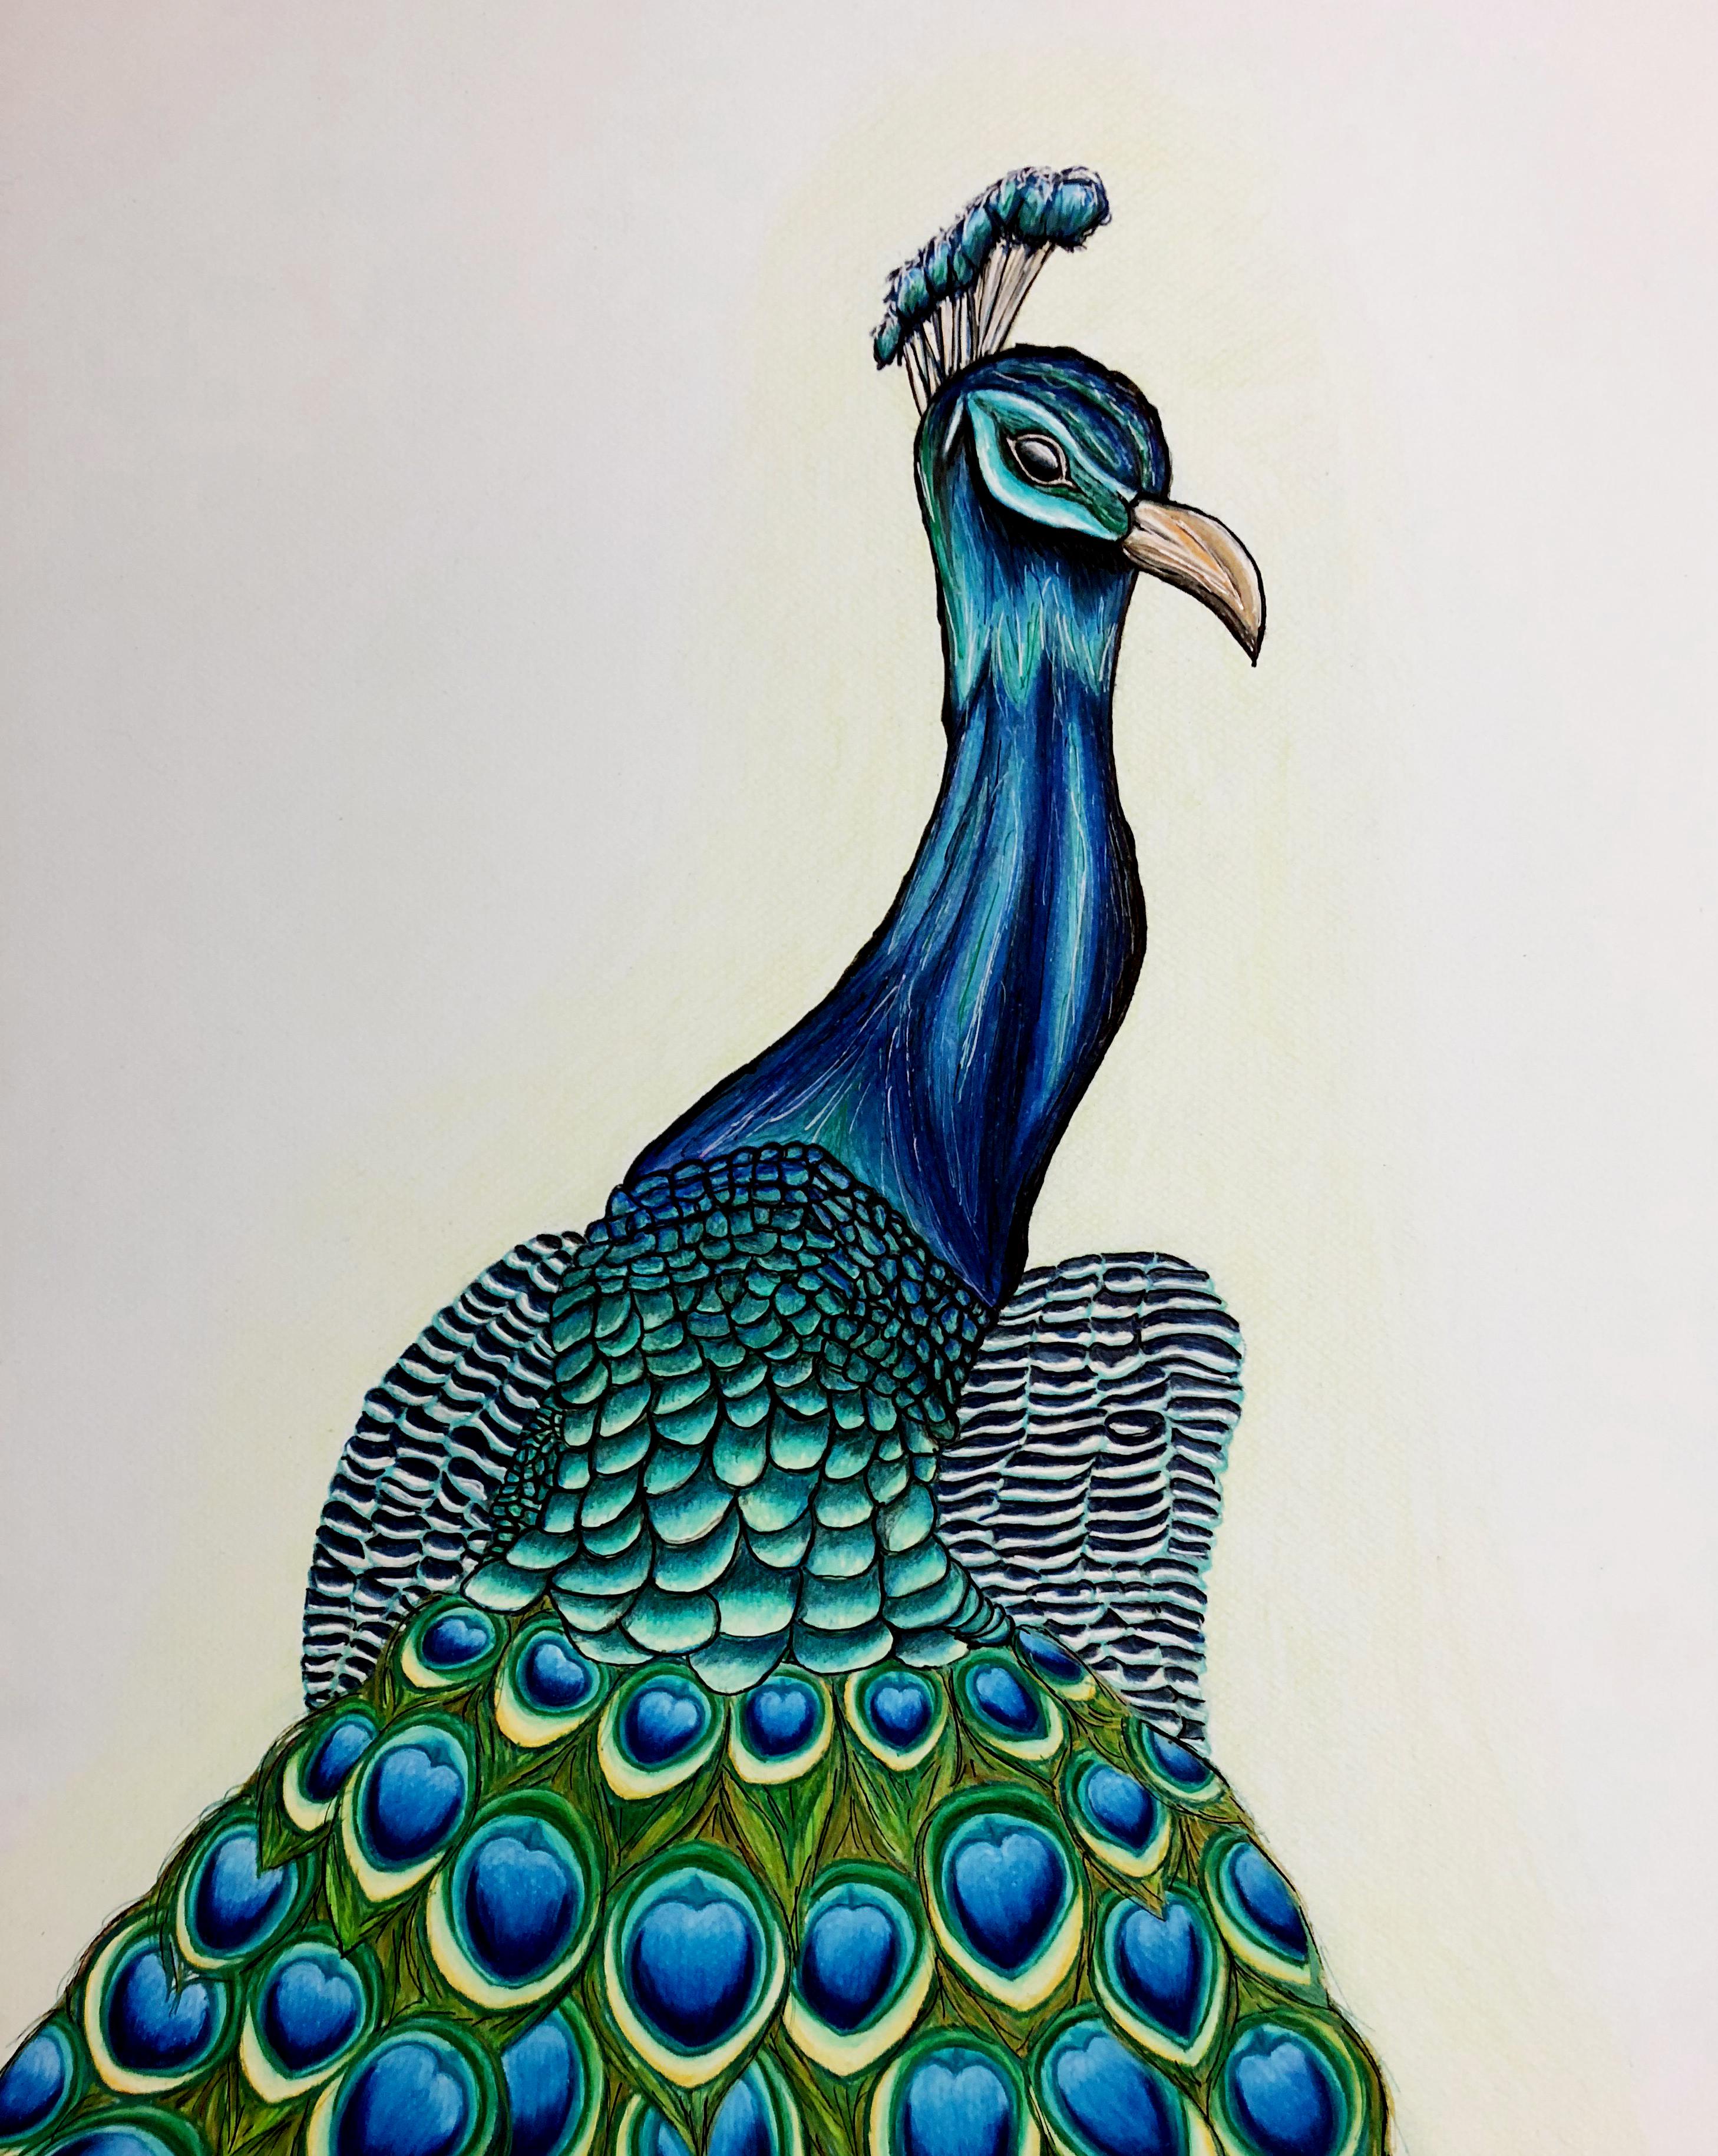 Blue Peacock